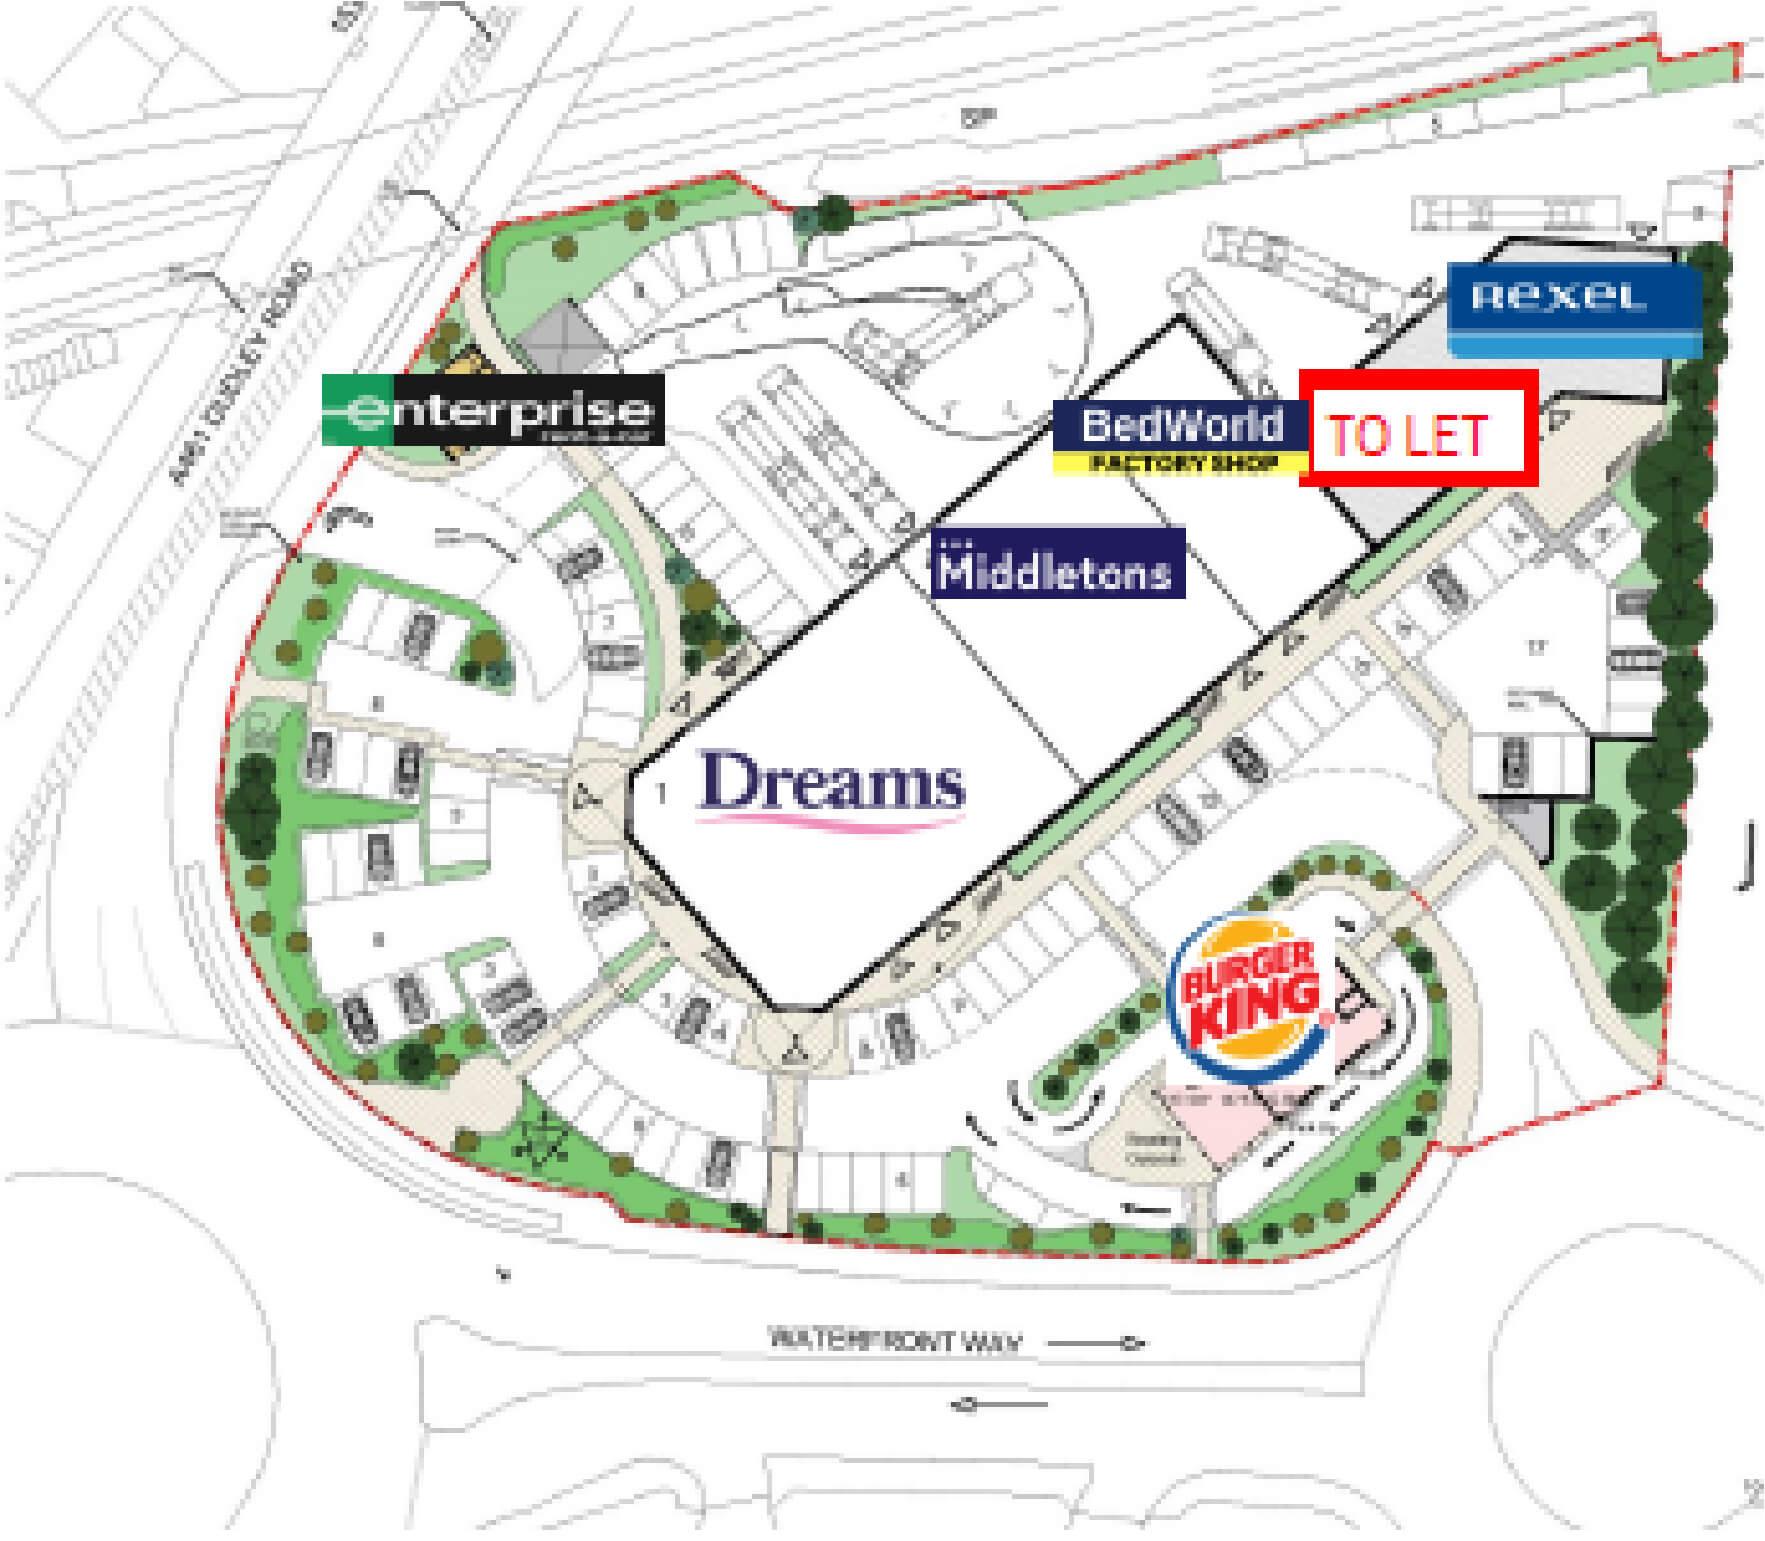 Brierley Hill Waterfront Way 2021 plan